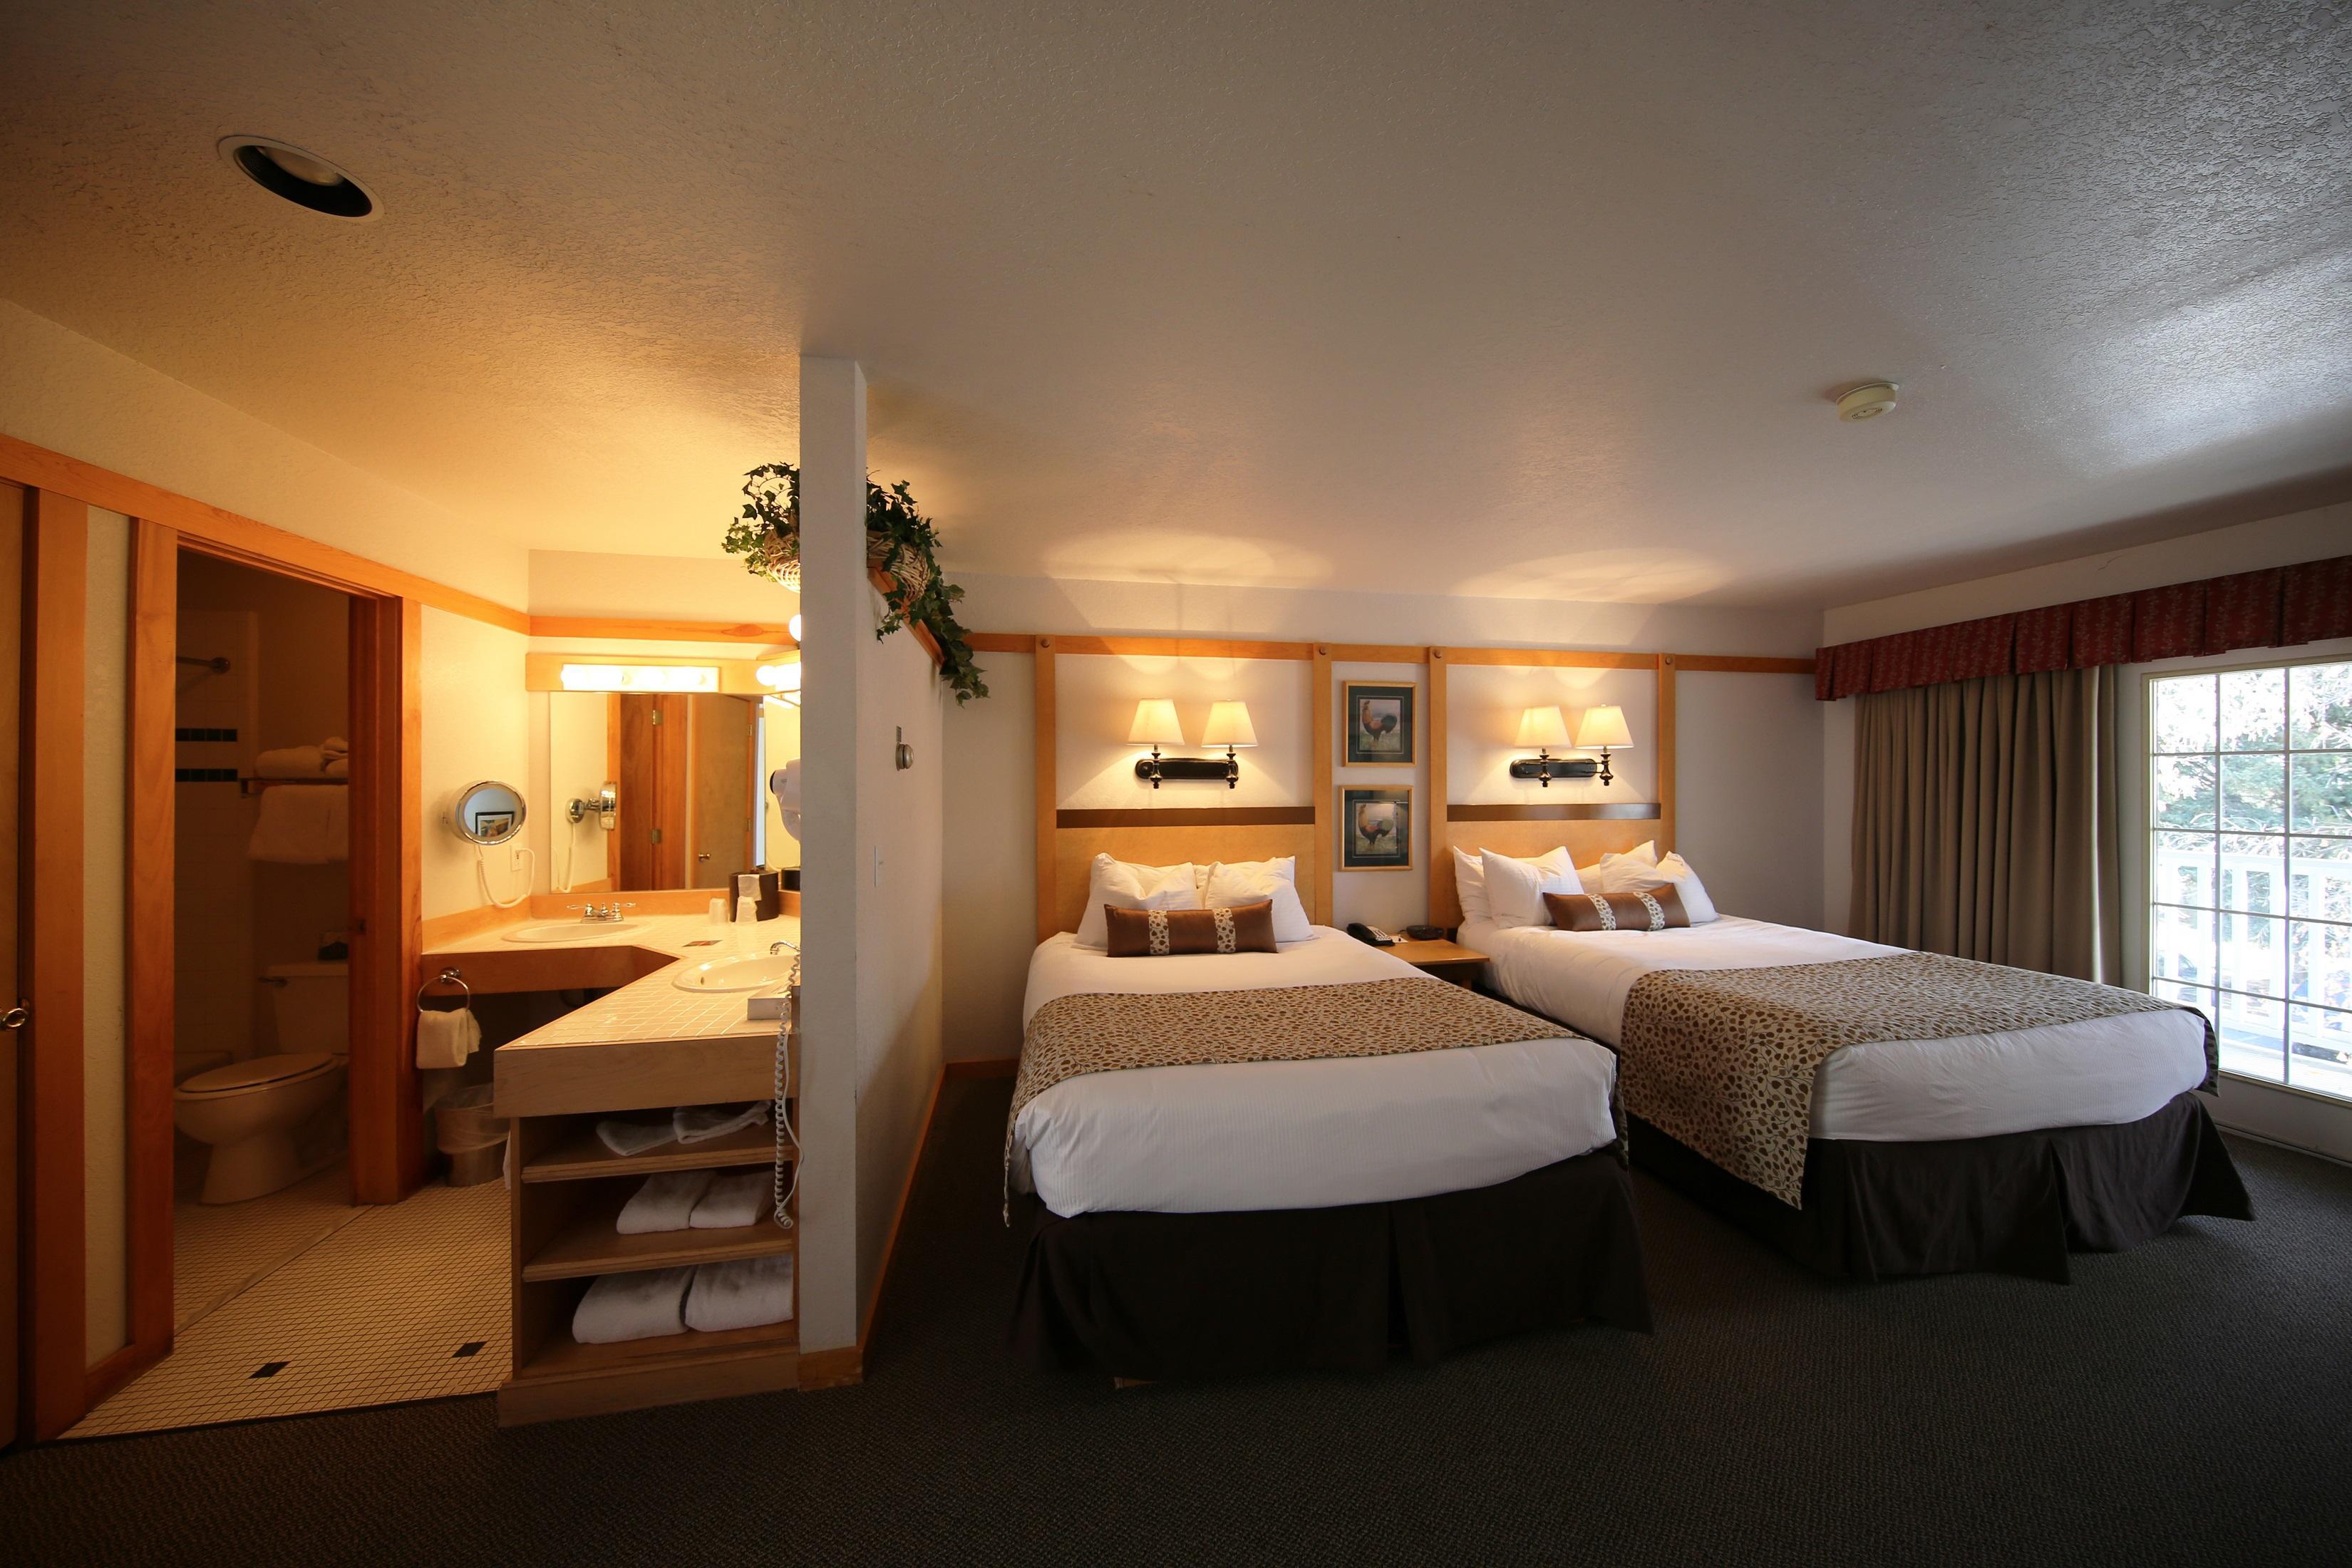 Homestead Resort image 3